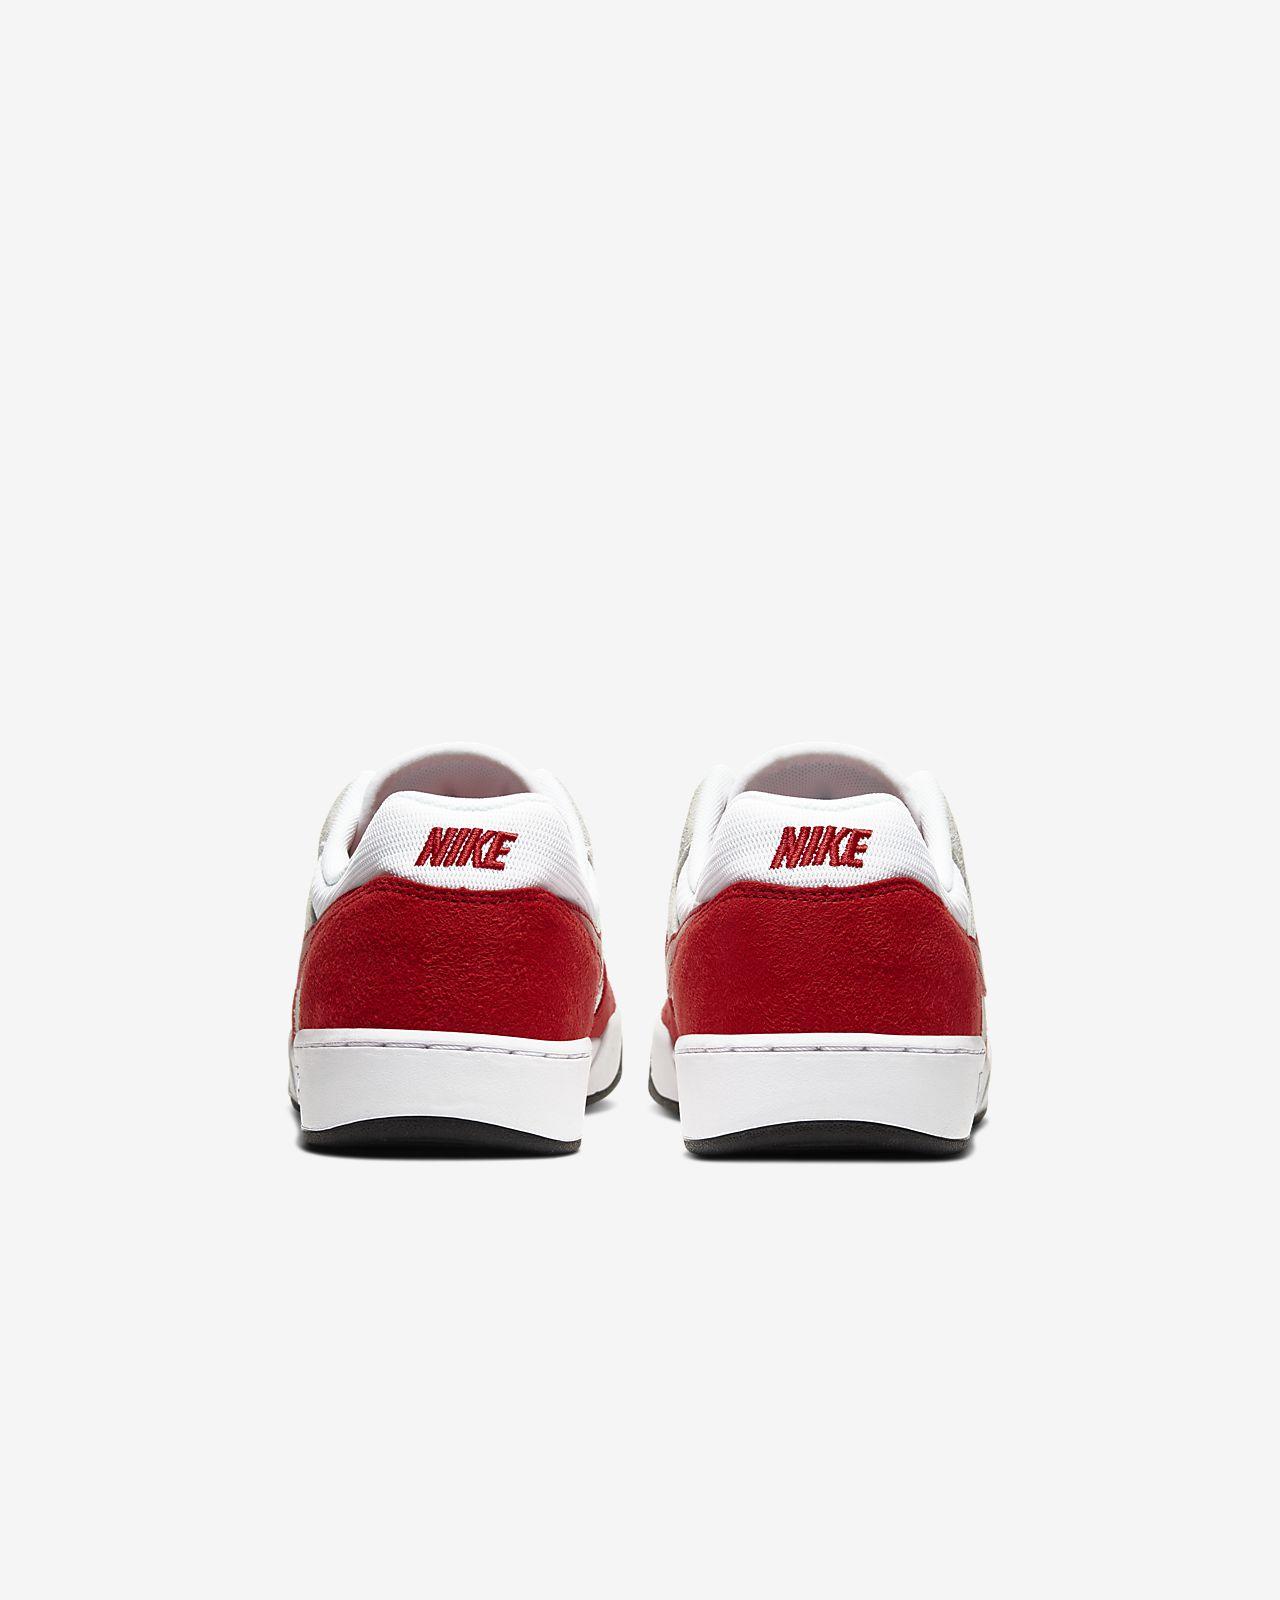 buying now unique design hot sales Chaussure de skateboard Nike SB GTS Return Premium. Nike FR